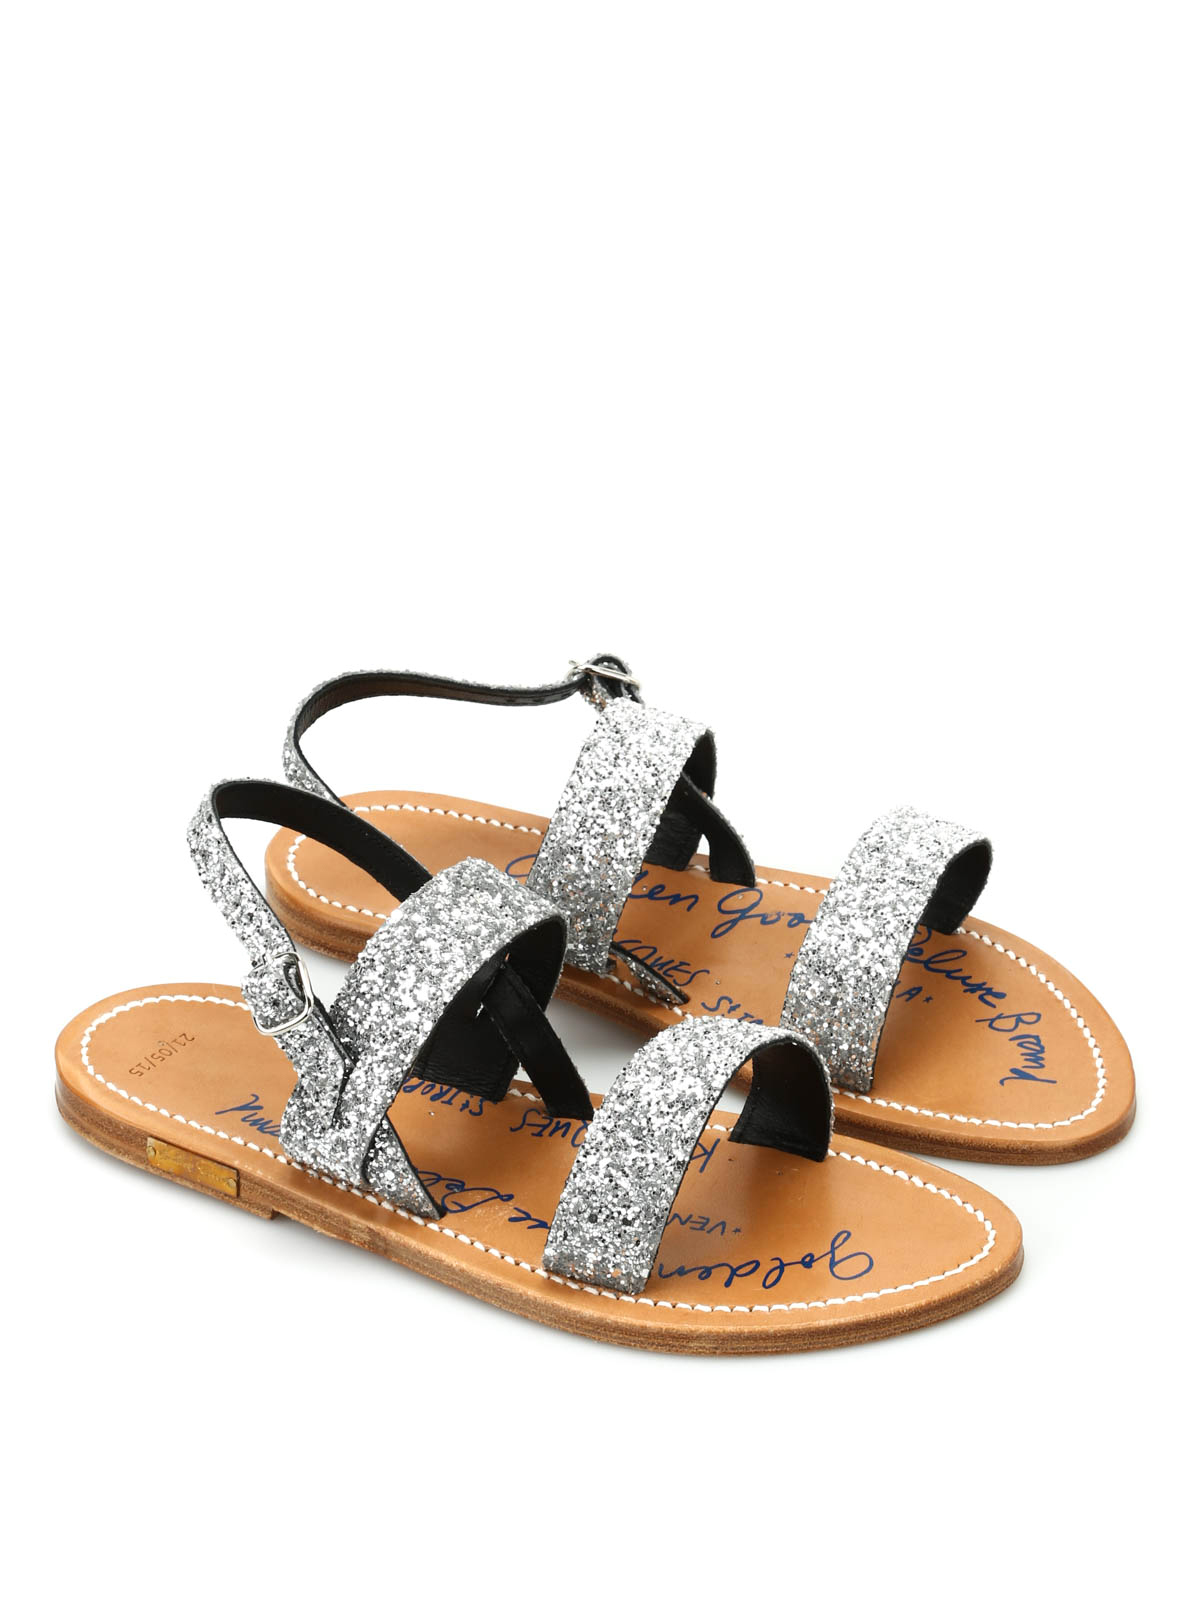 Golden Goose - Glitter straps sandals